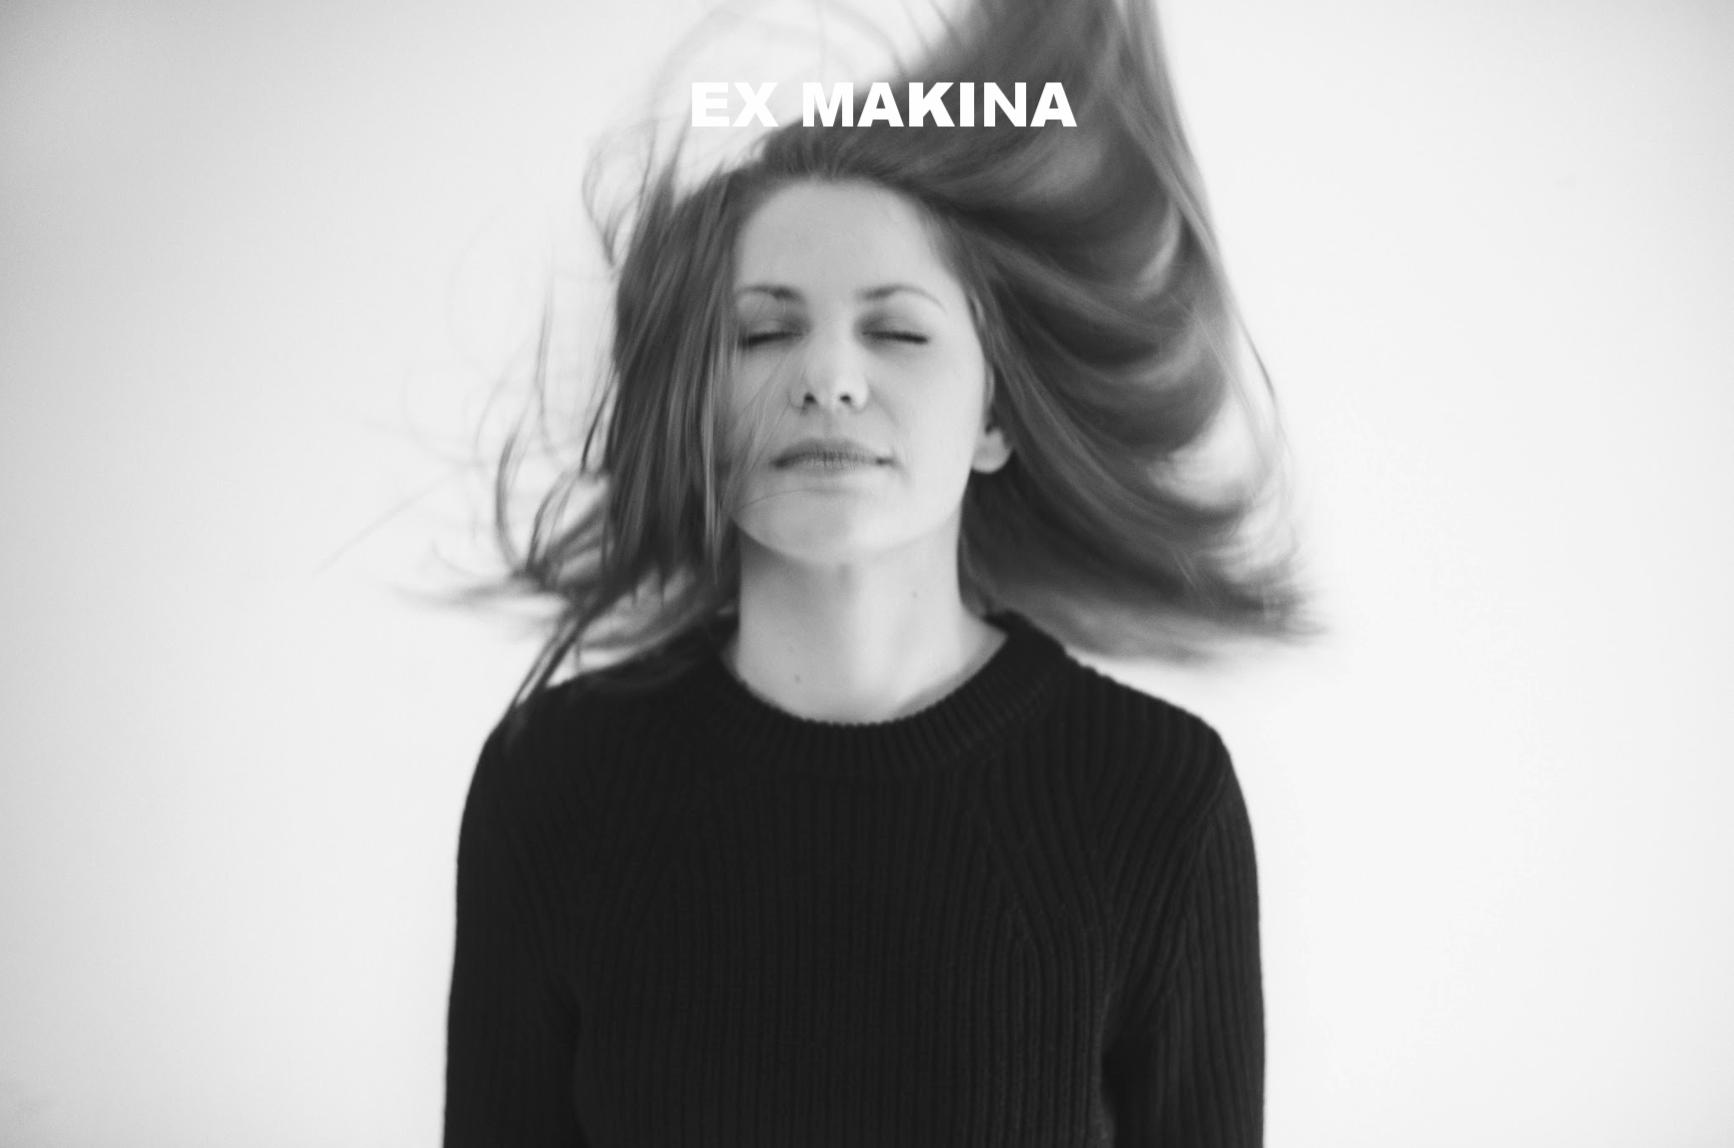 EX MAKINA